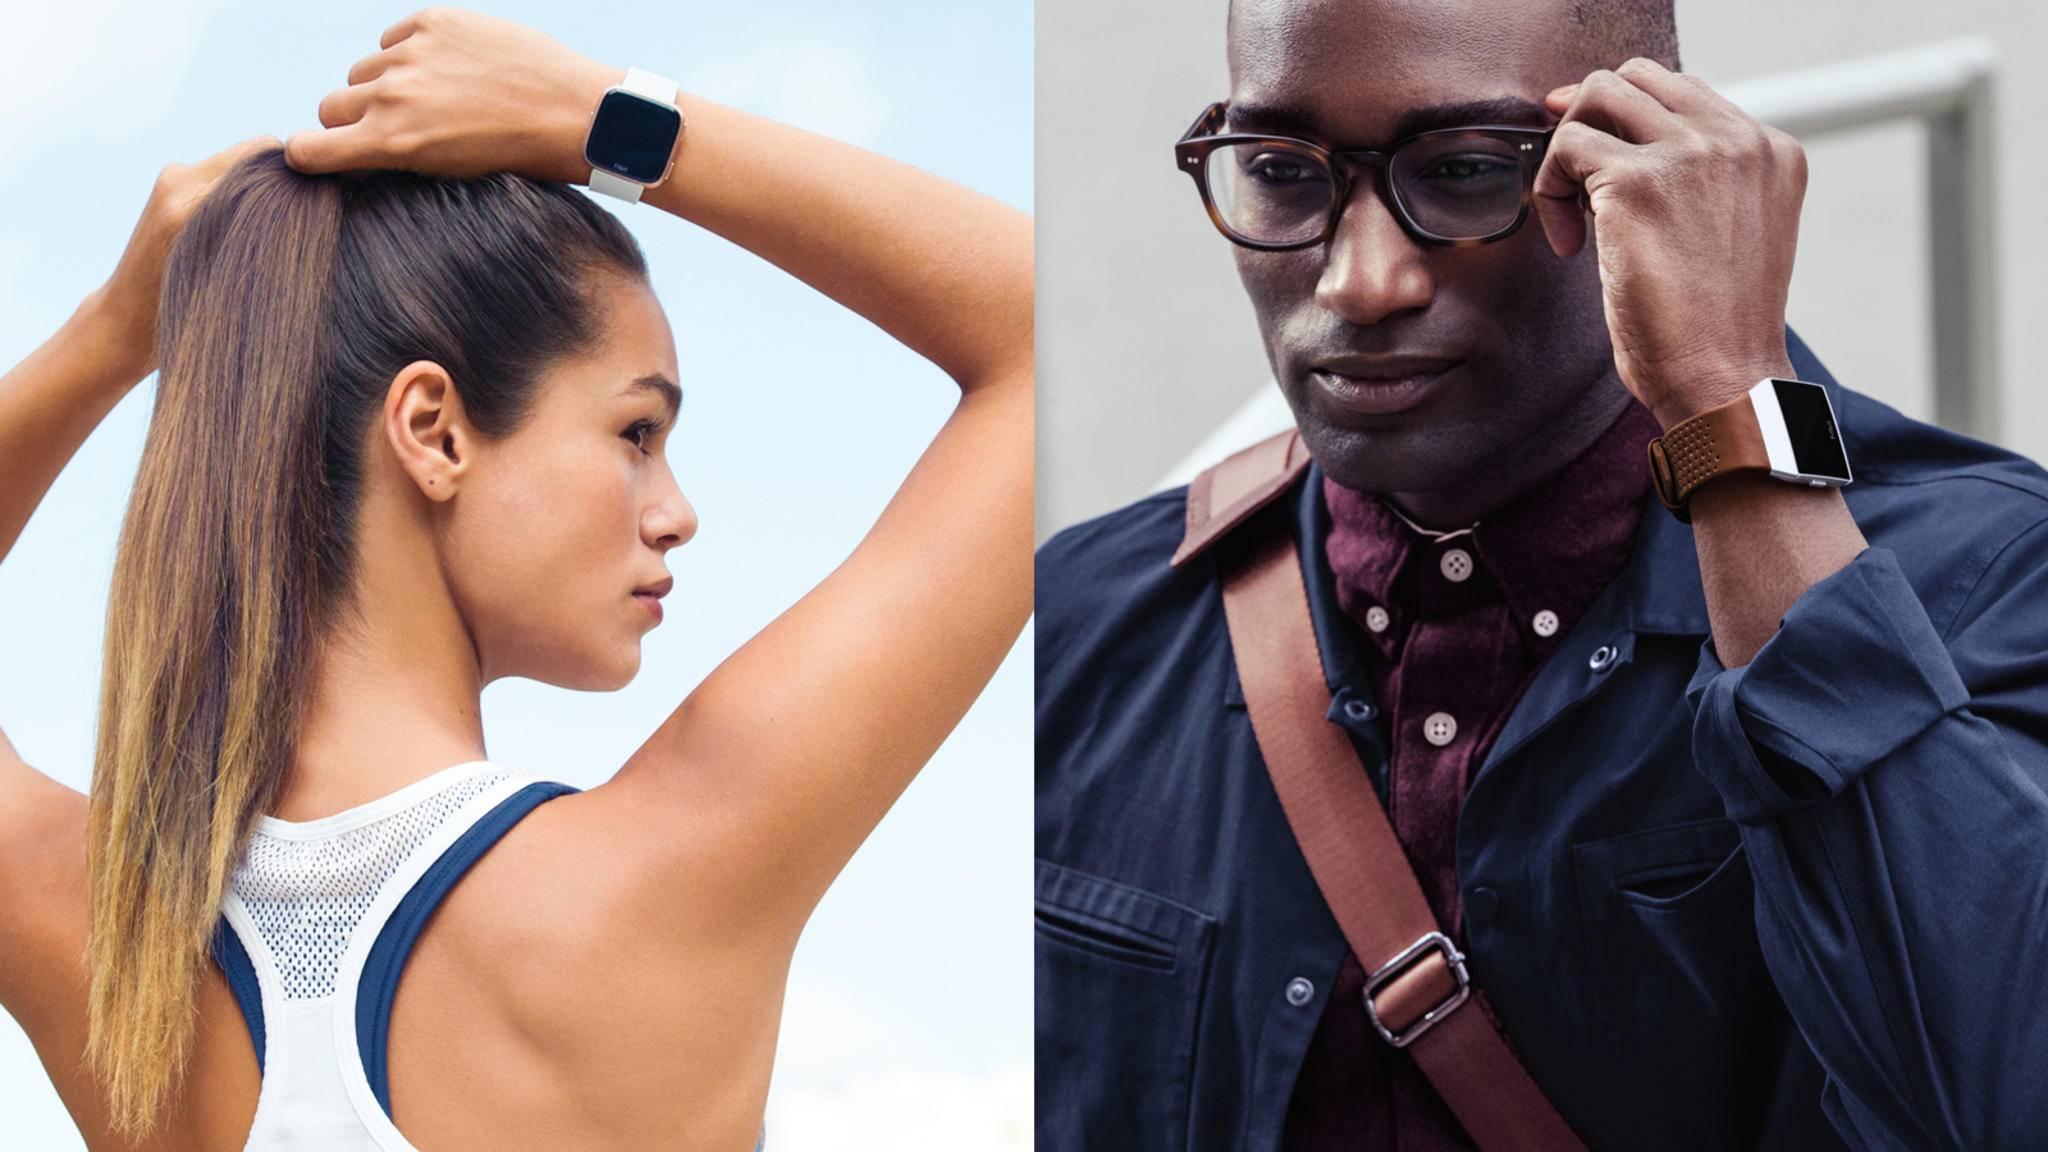 Es treten an: Fitbit Versa vs. Fitbit Ionic.